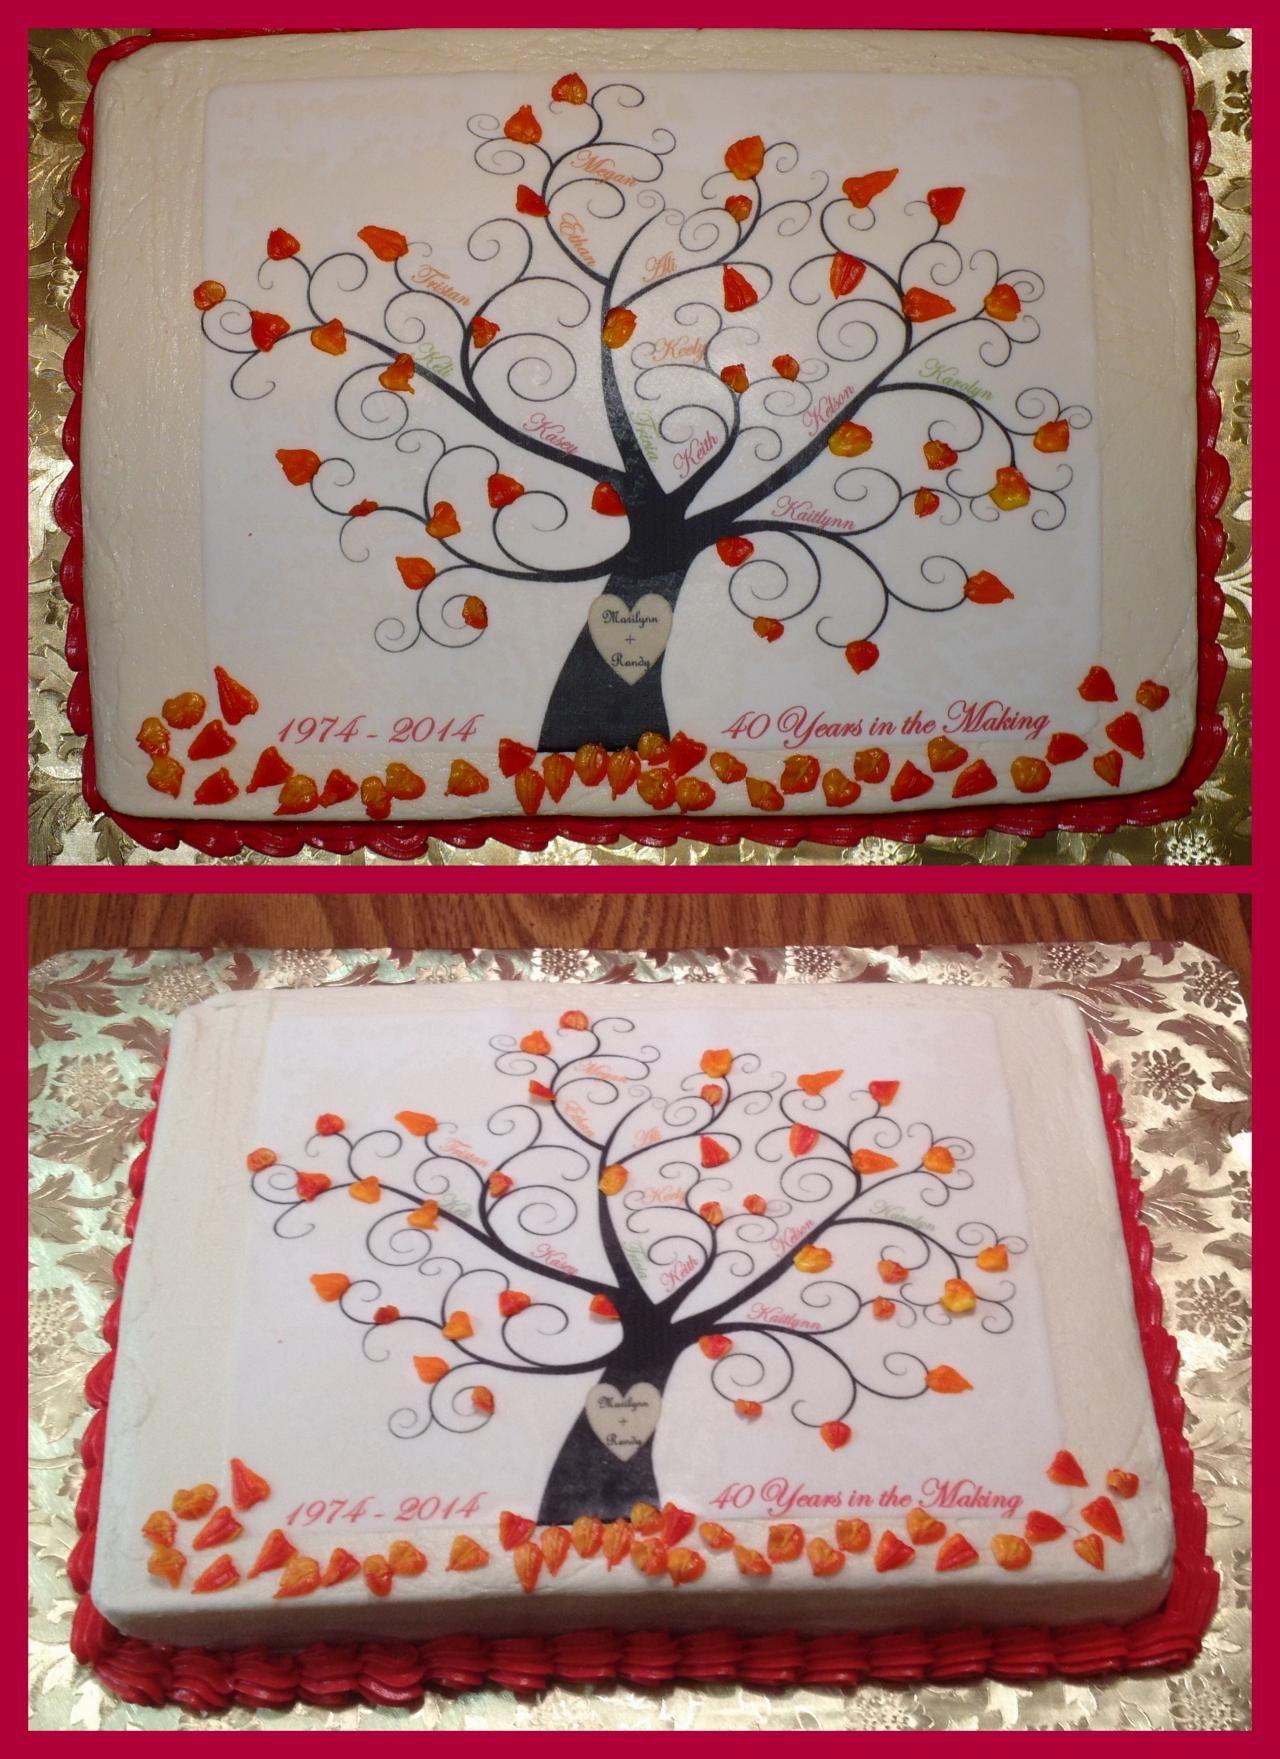 Family Tree 40th Anniversary Cake